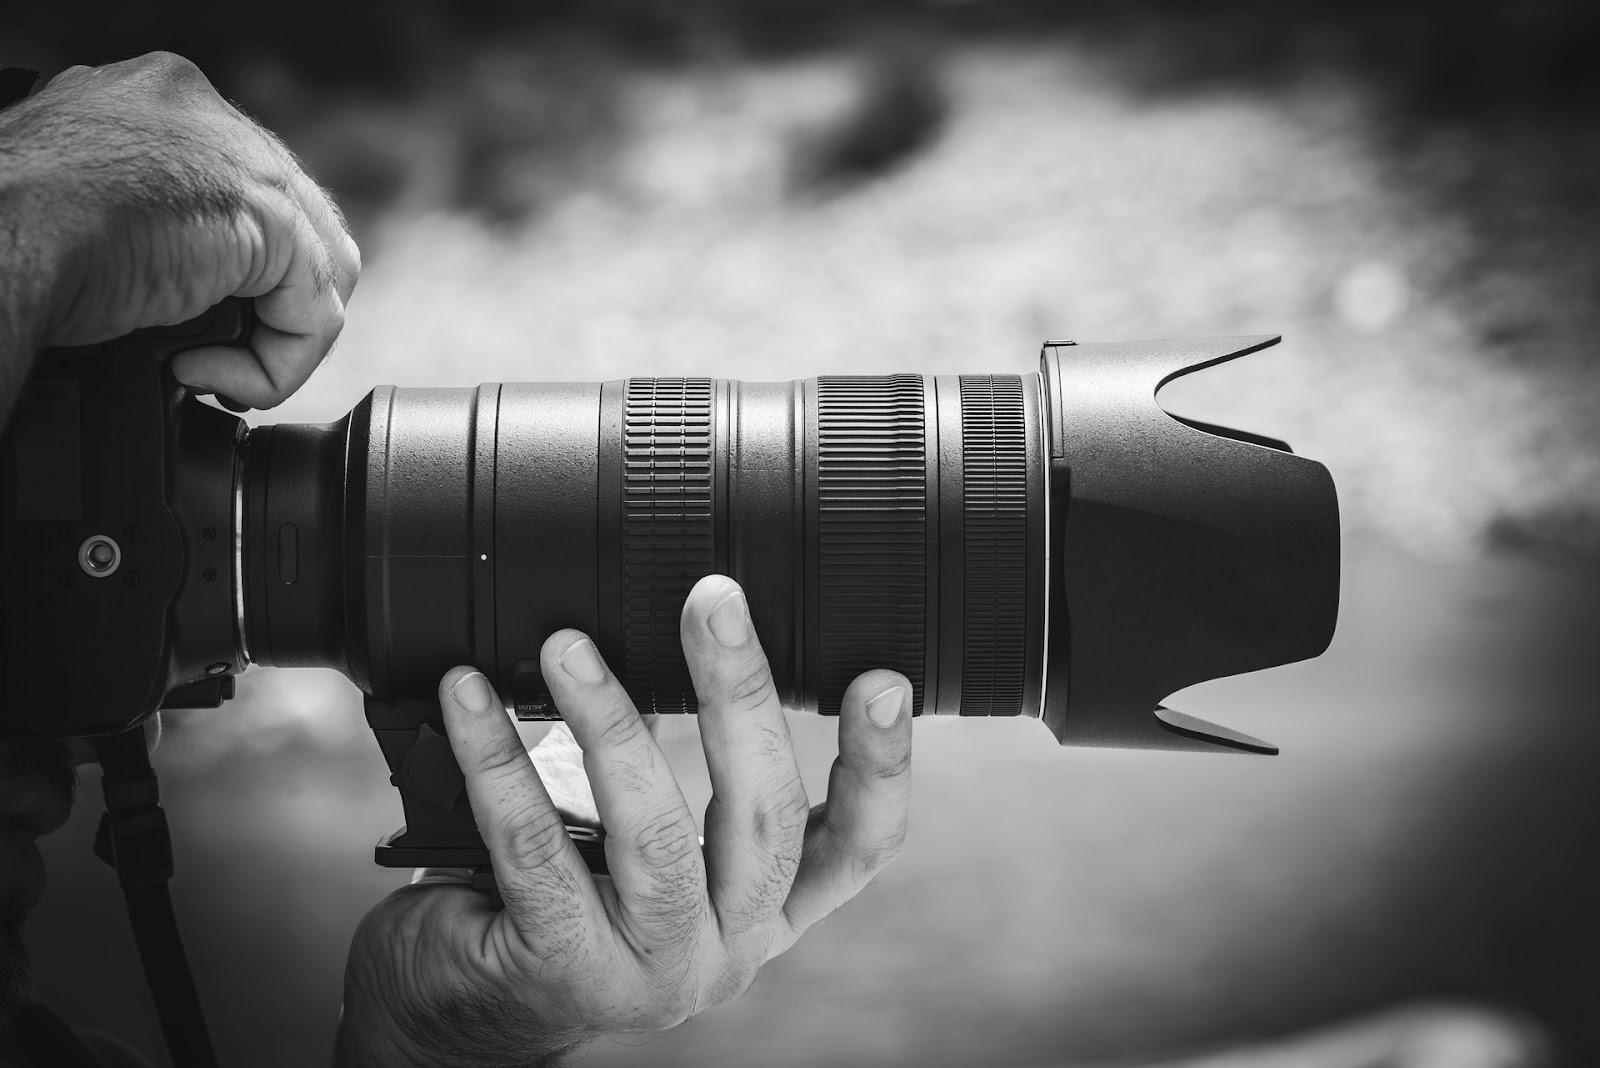 lens with lens hood